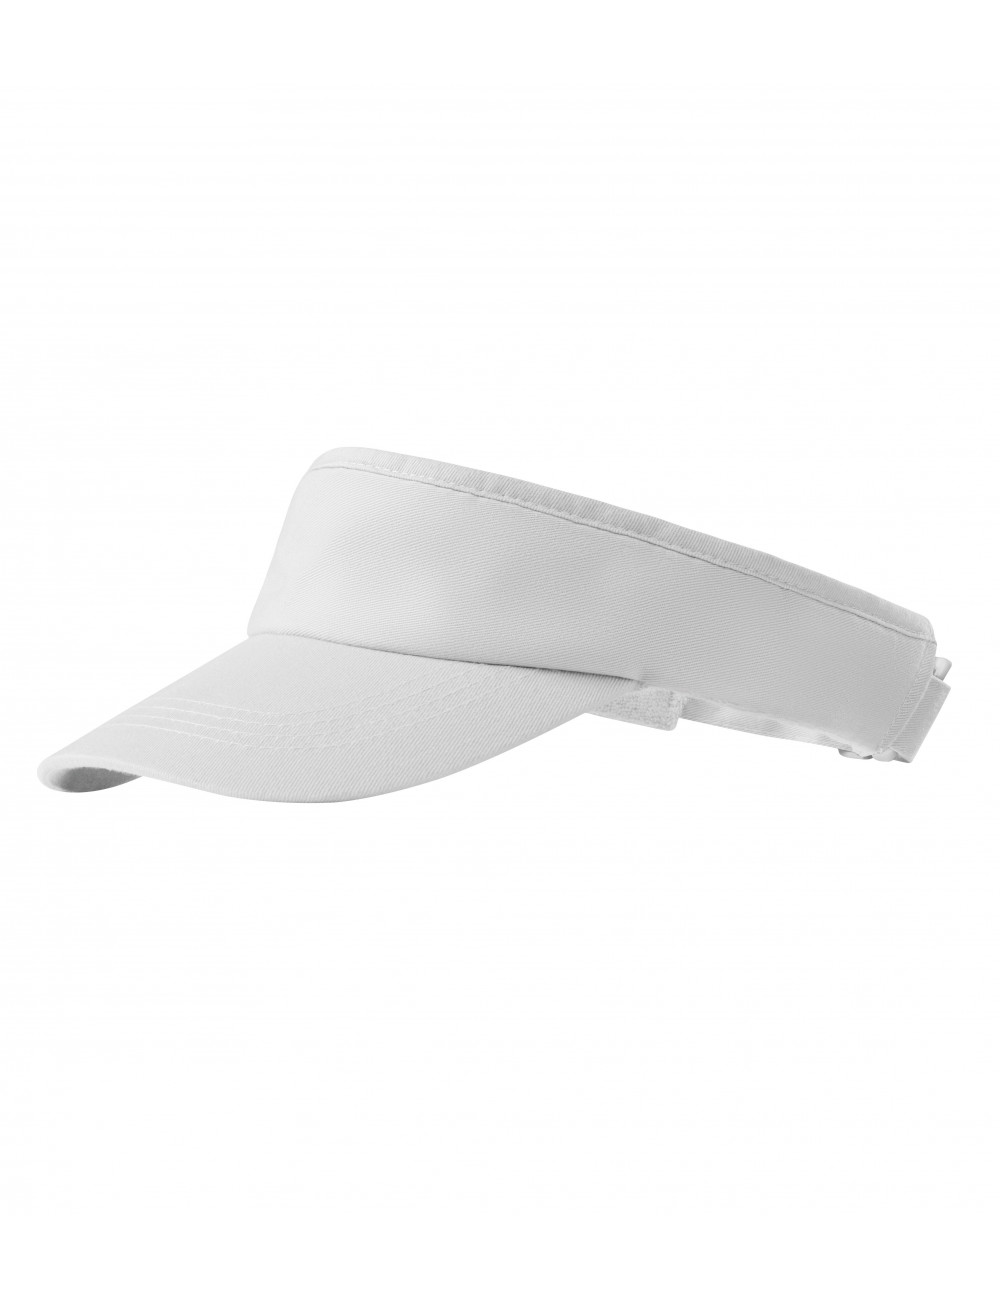 Adler MALFINI Daszki unisex Sunvisor 310 biały